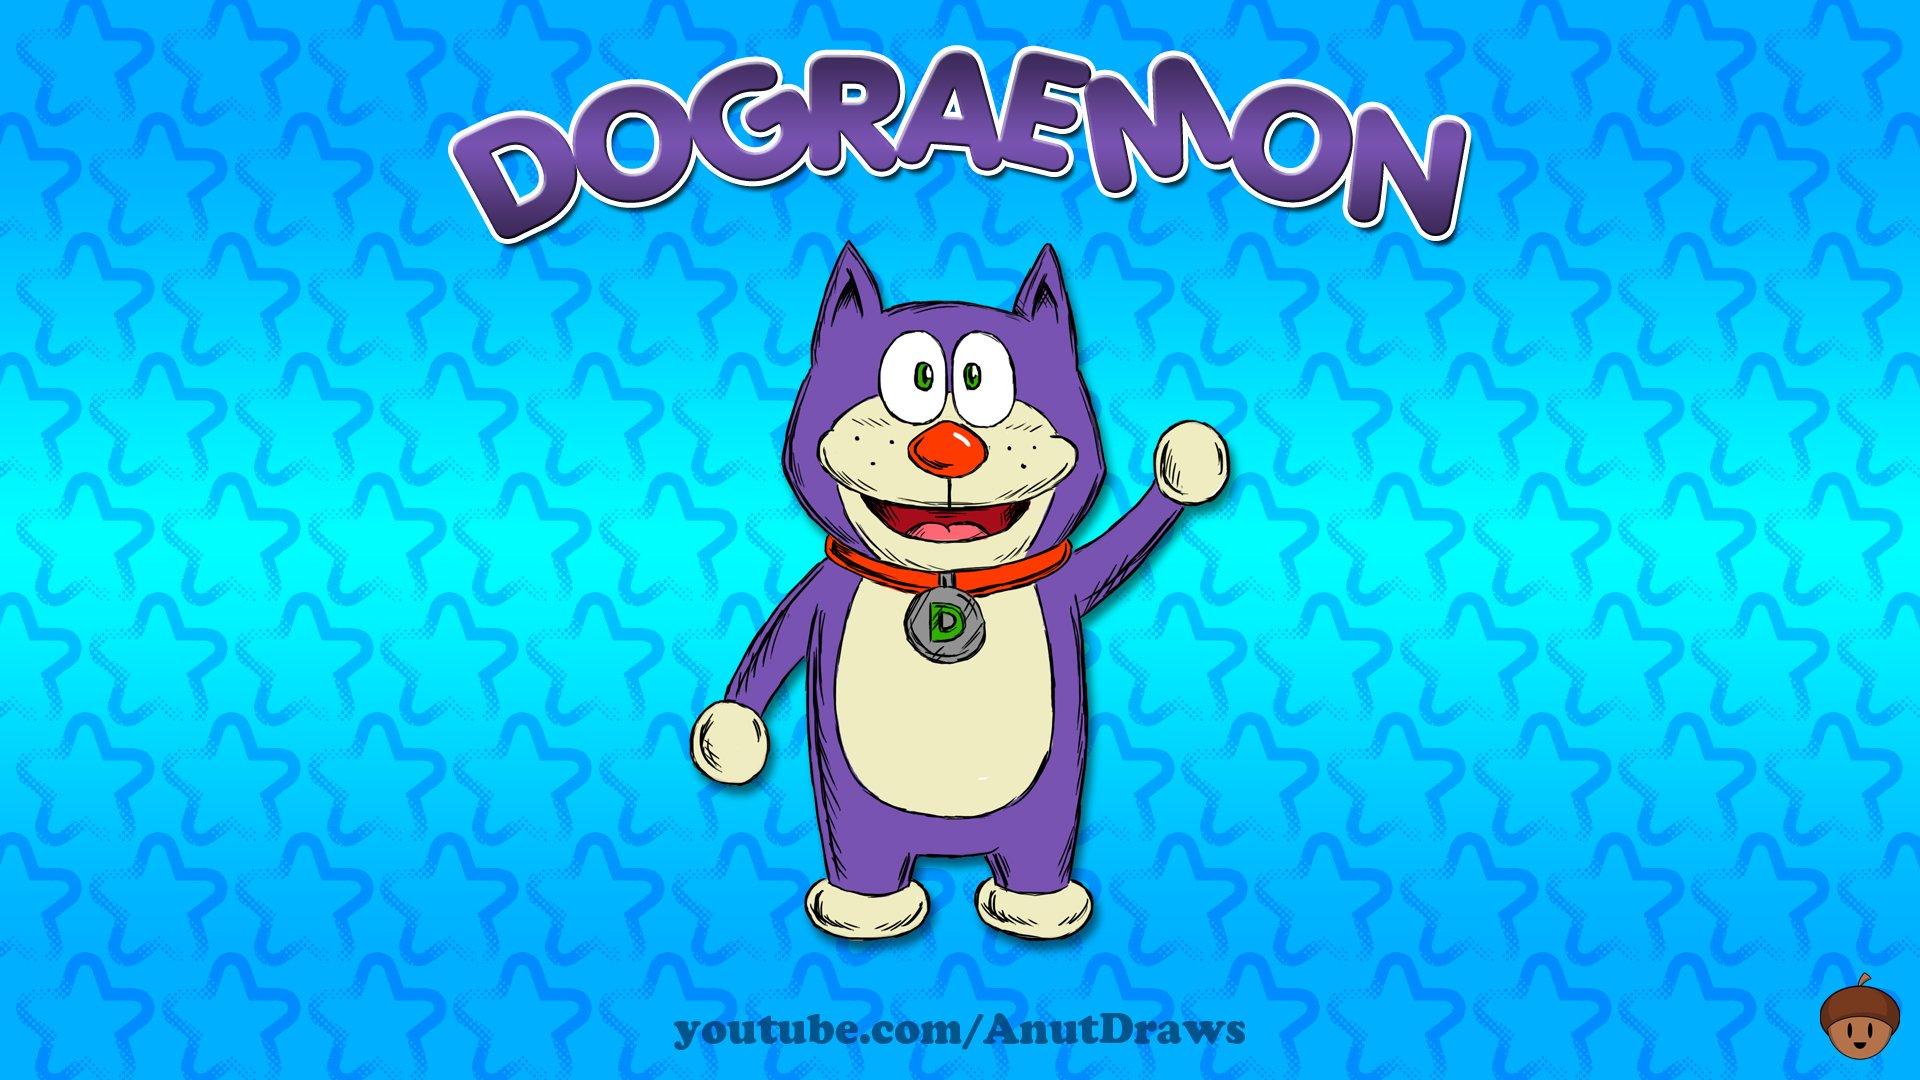 Doraemon Hd Wallpaper Background Image 1920x1080 Id499243